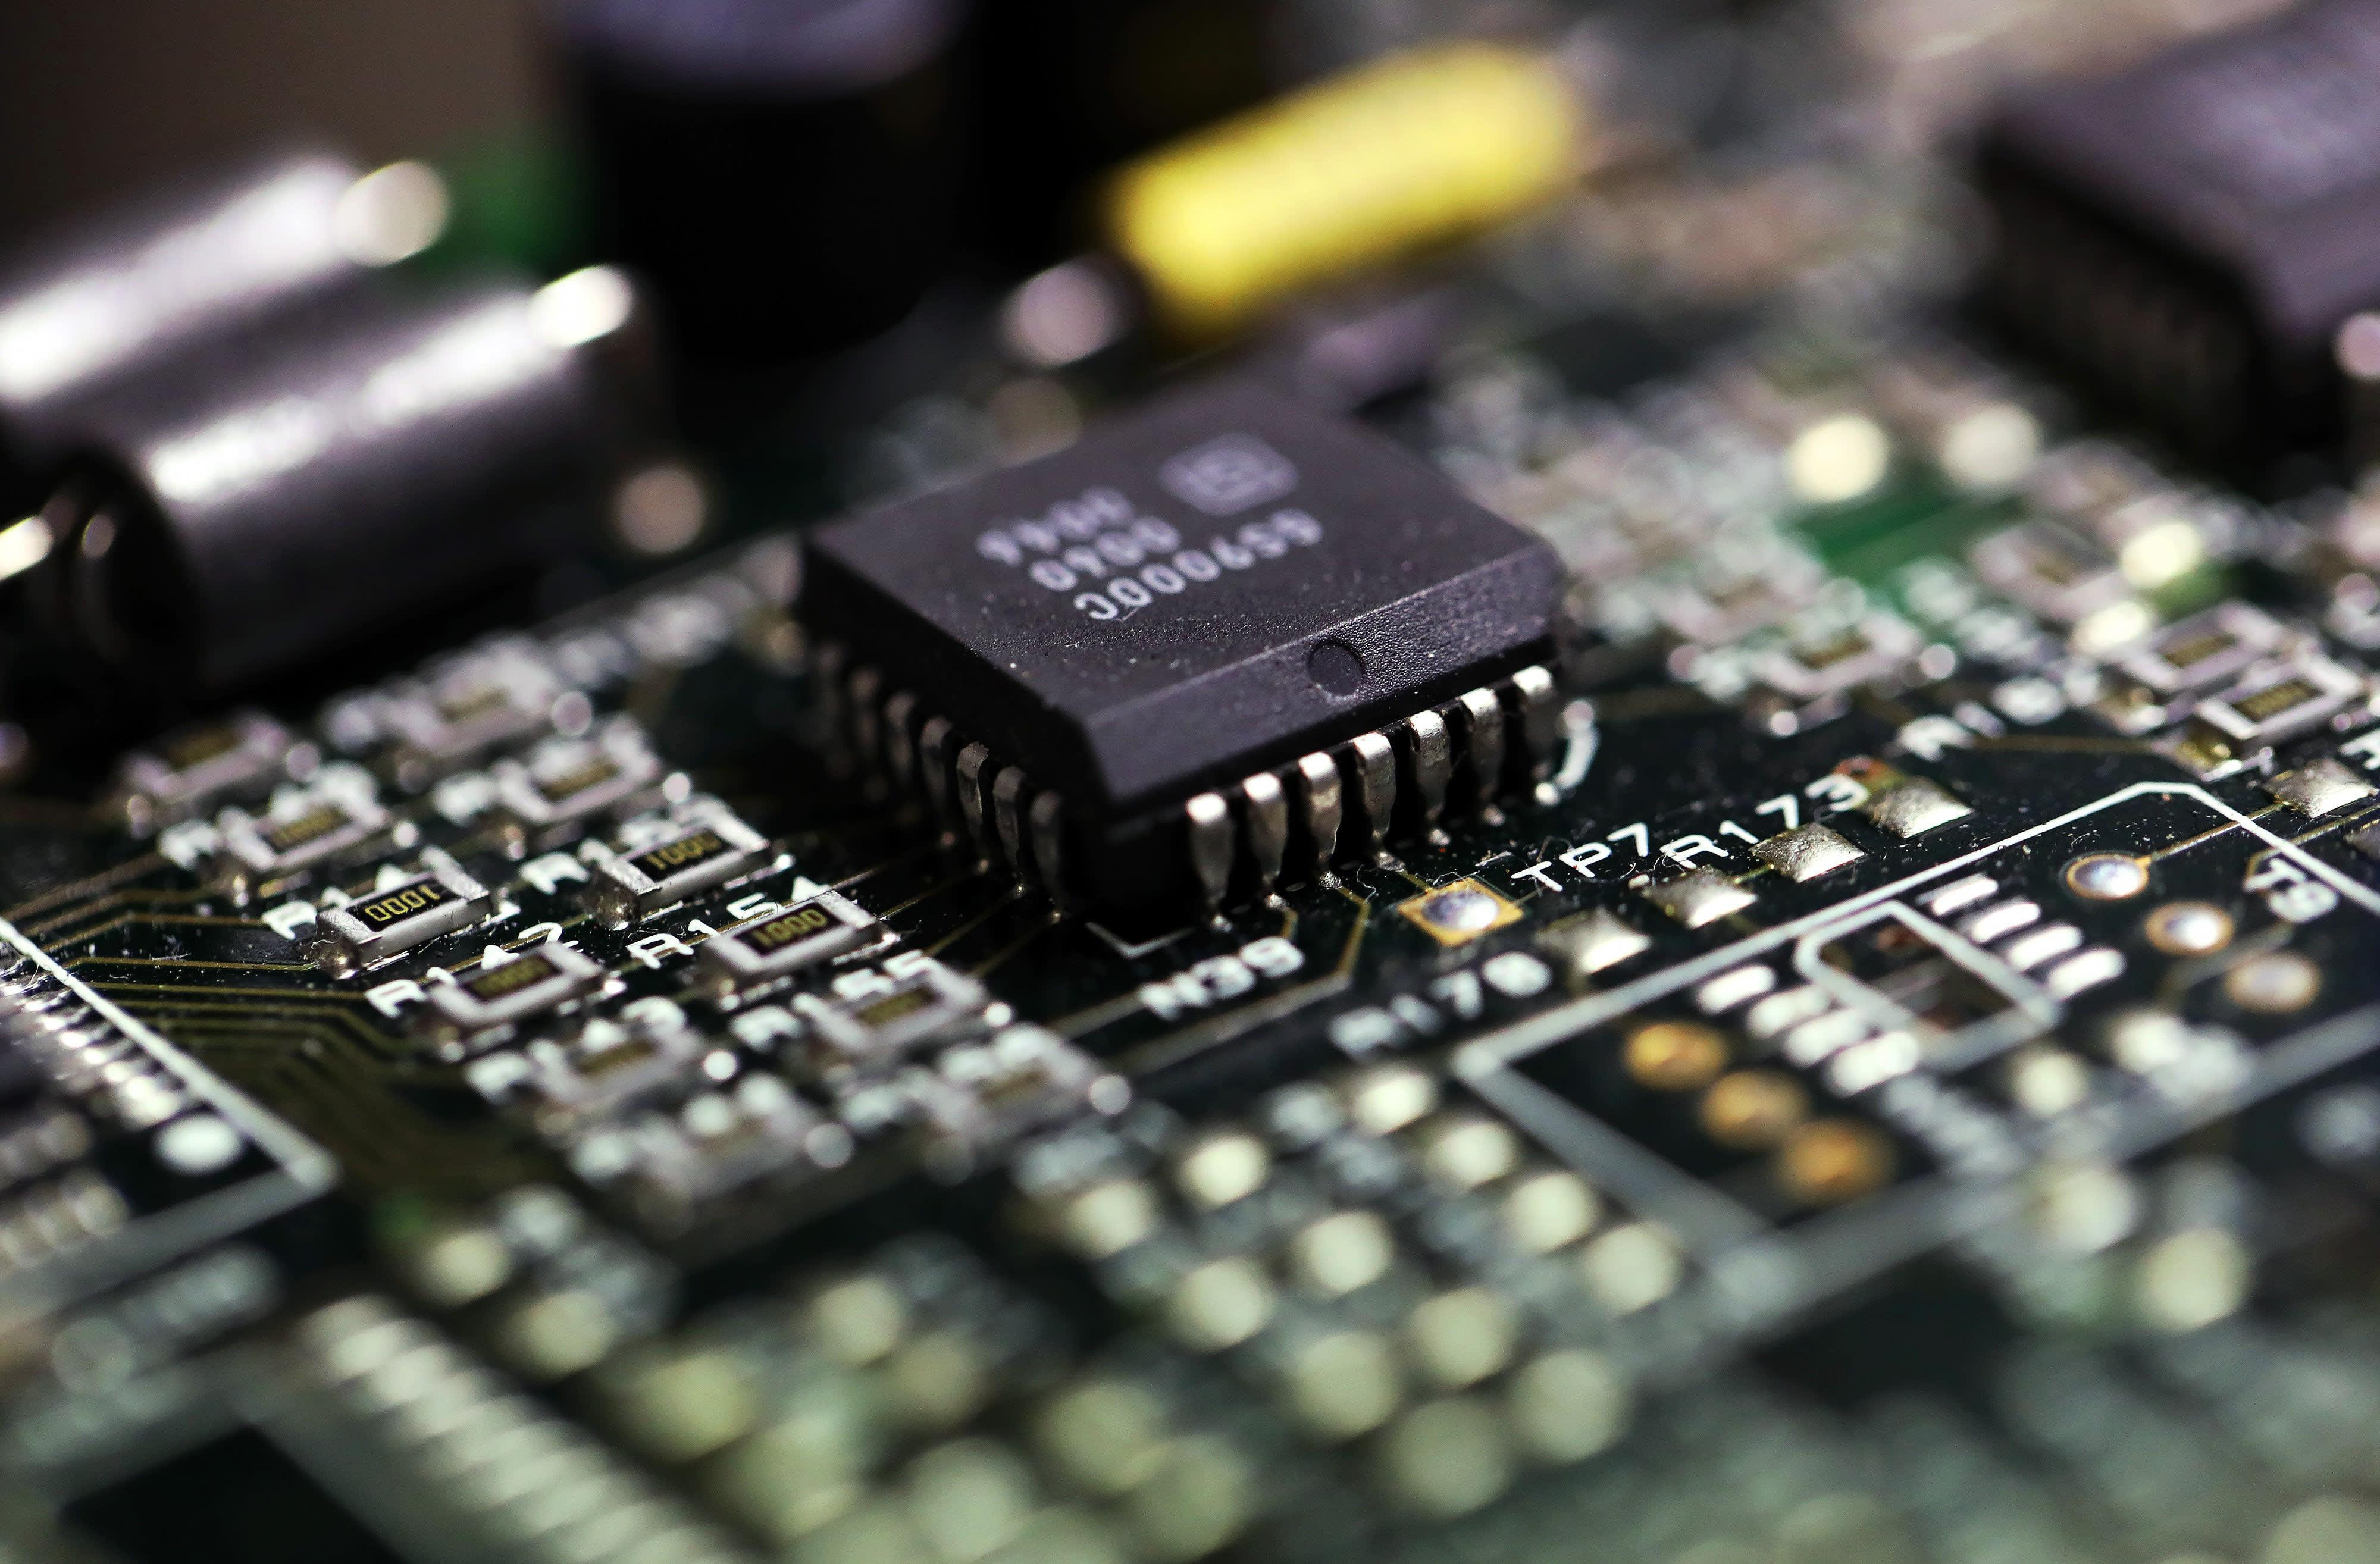 Adviser on tech push as Covid-19 drives client demand